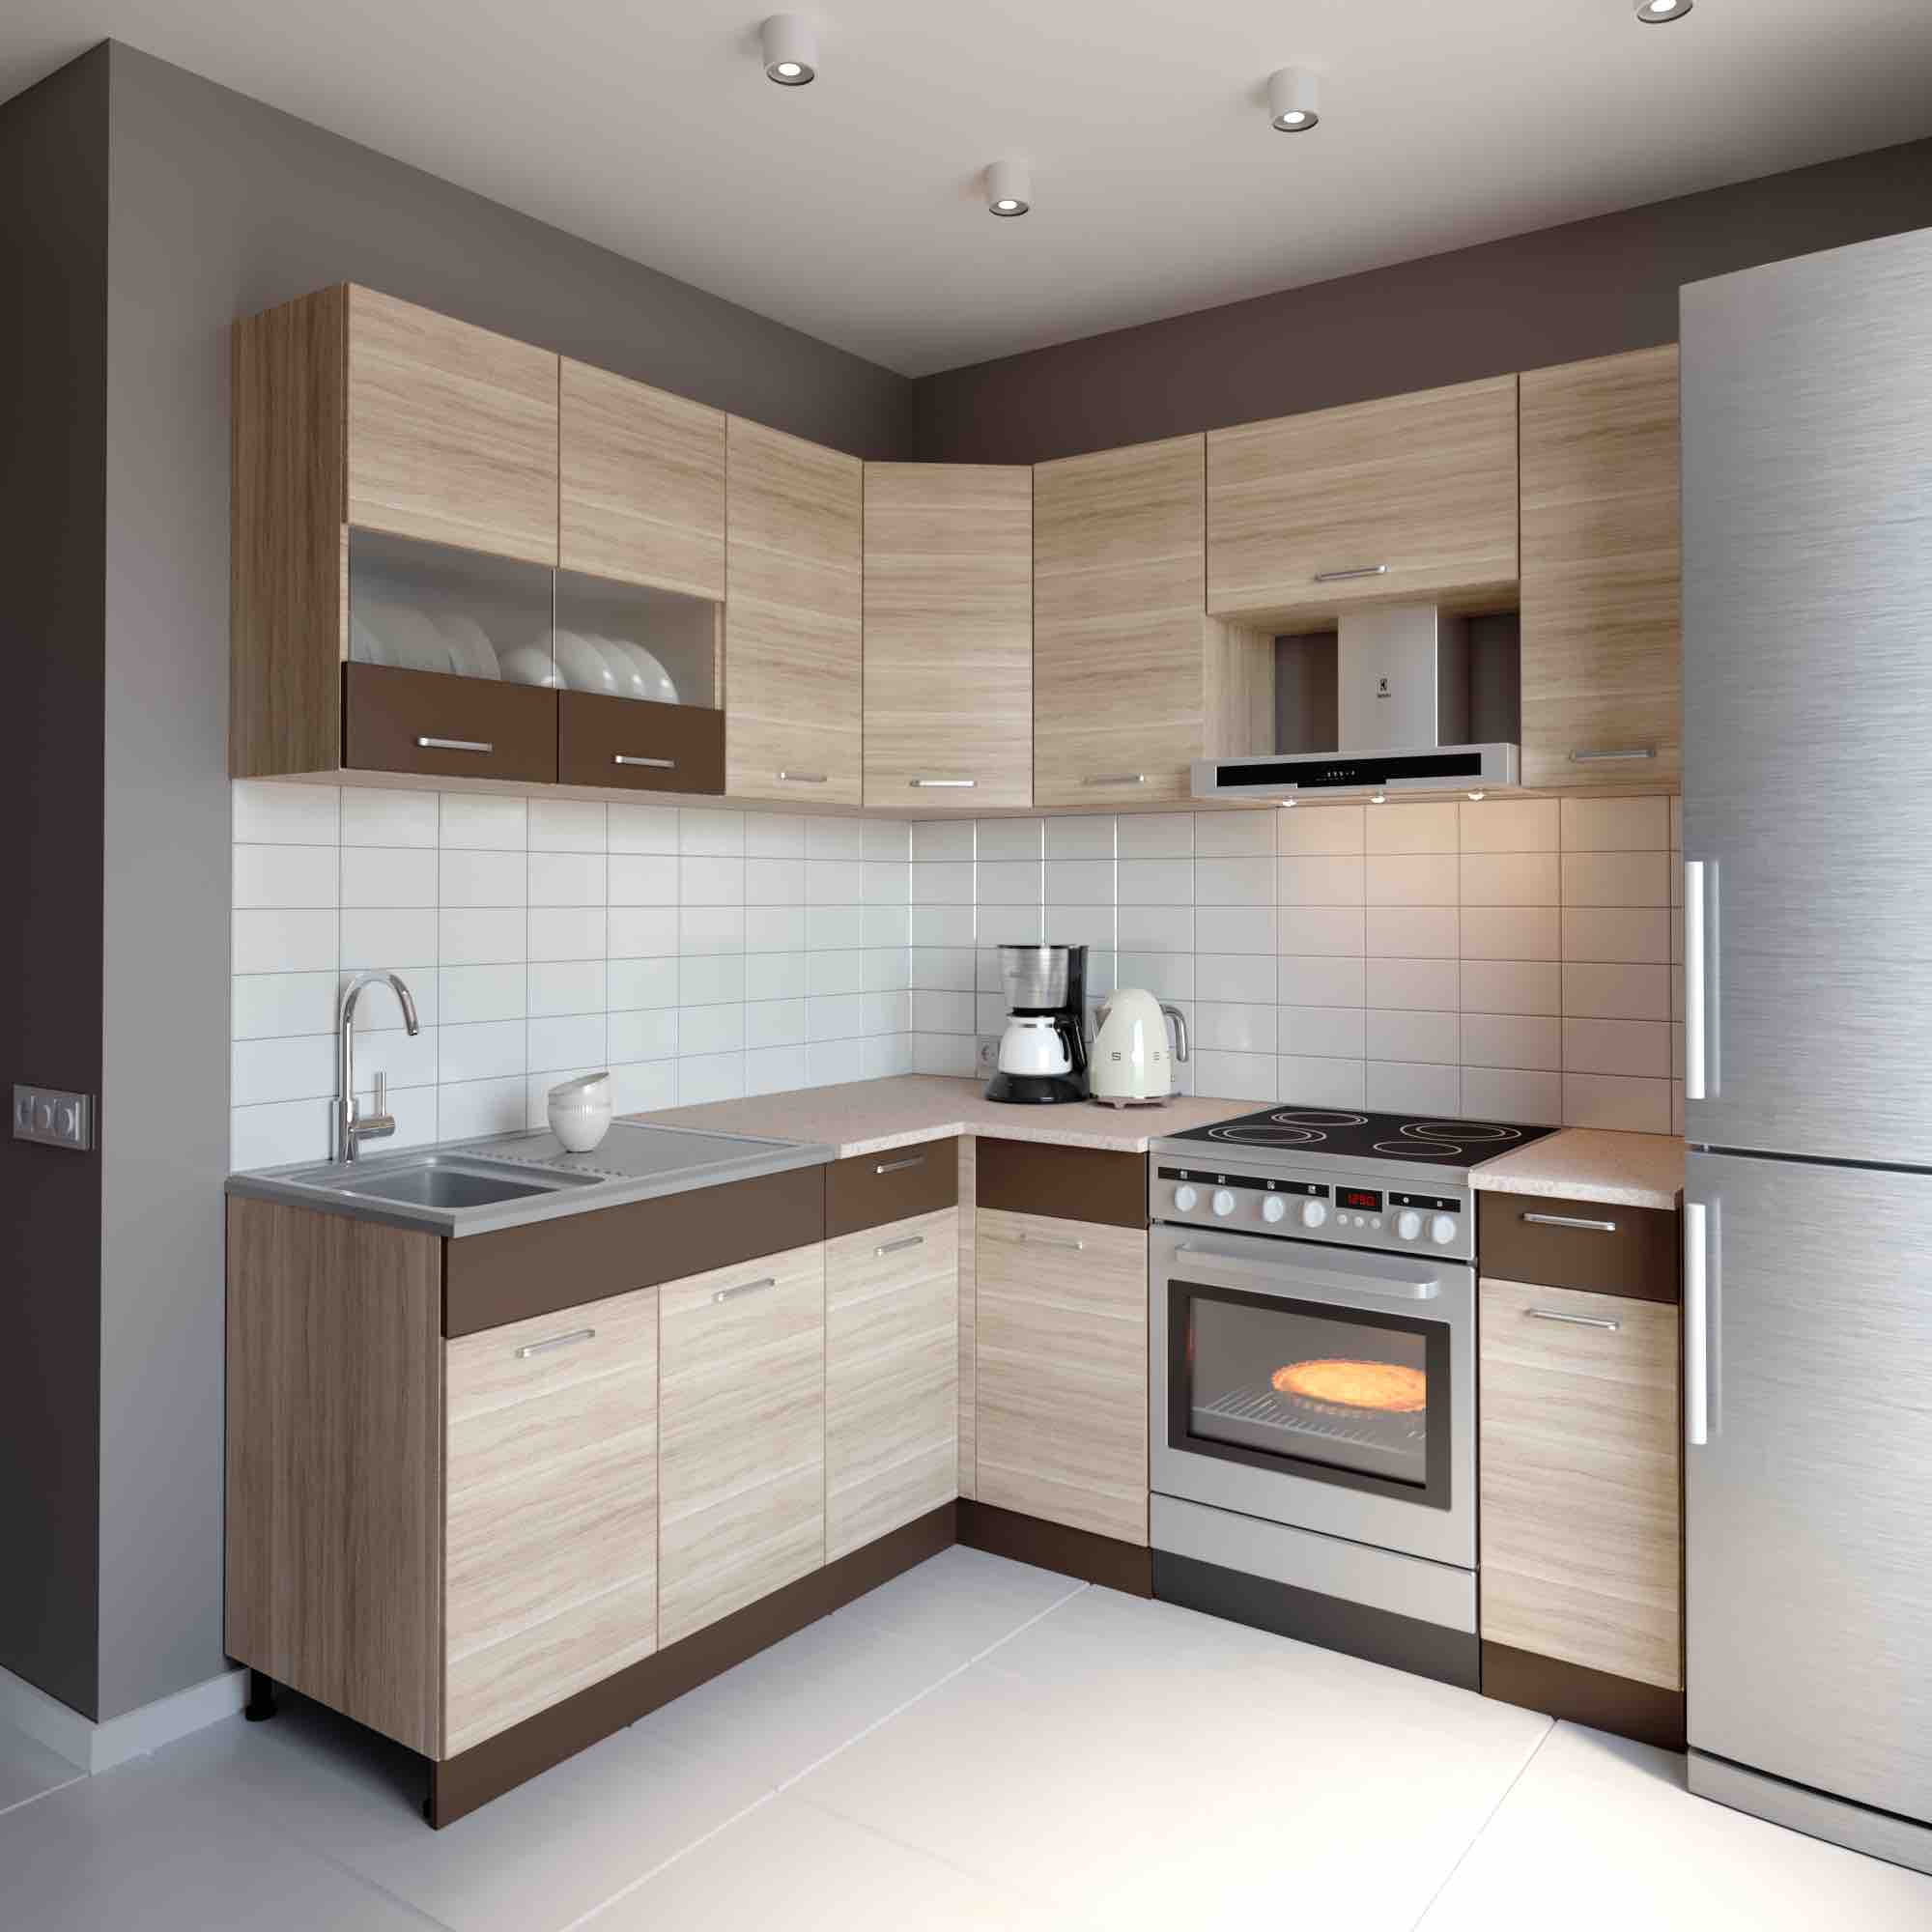 Full Size of Küche L Form Mit E Geräte Küche L Form Ikea Küche L Form Mit Kochinsel Küche L Form Ebay Kleinanzeigen Küche Küche L Form